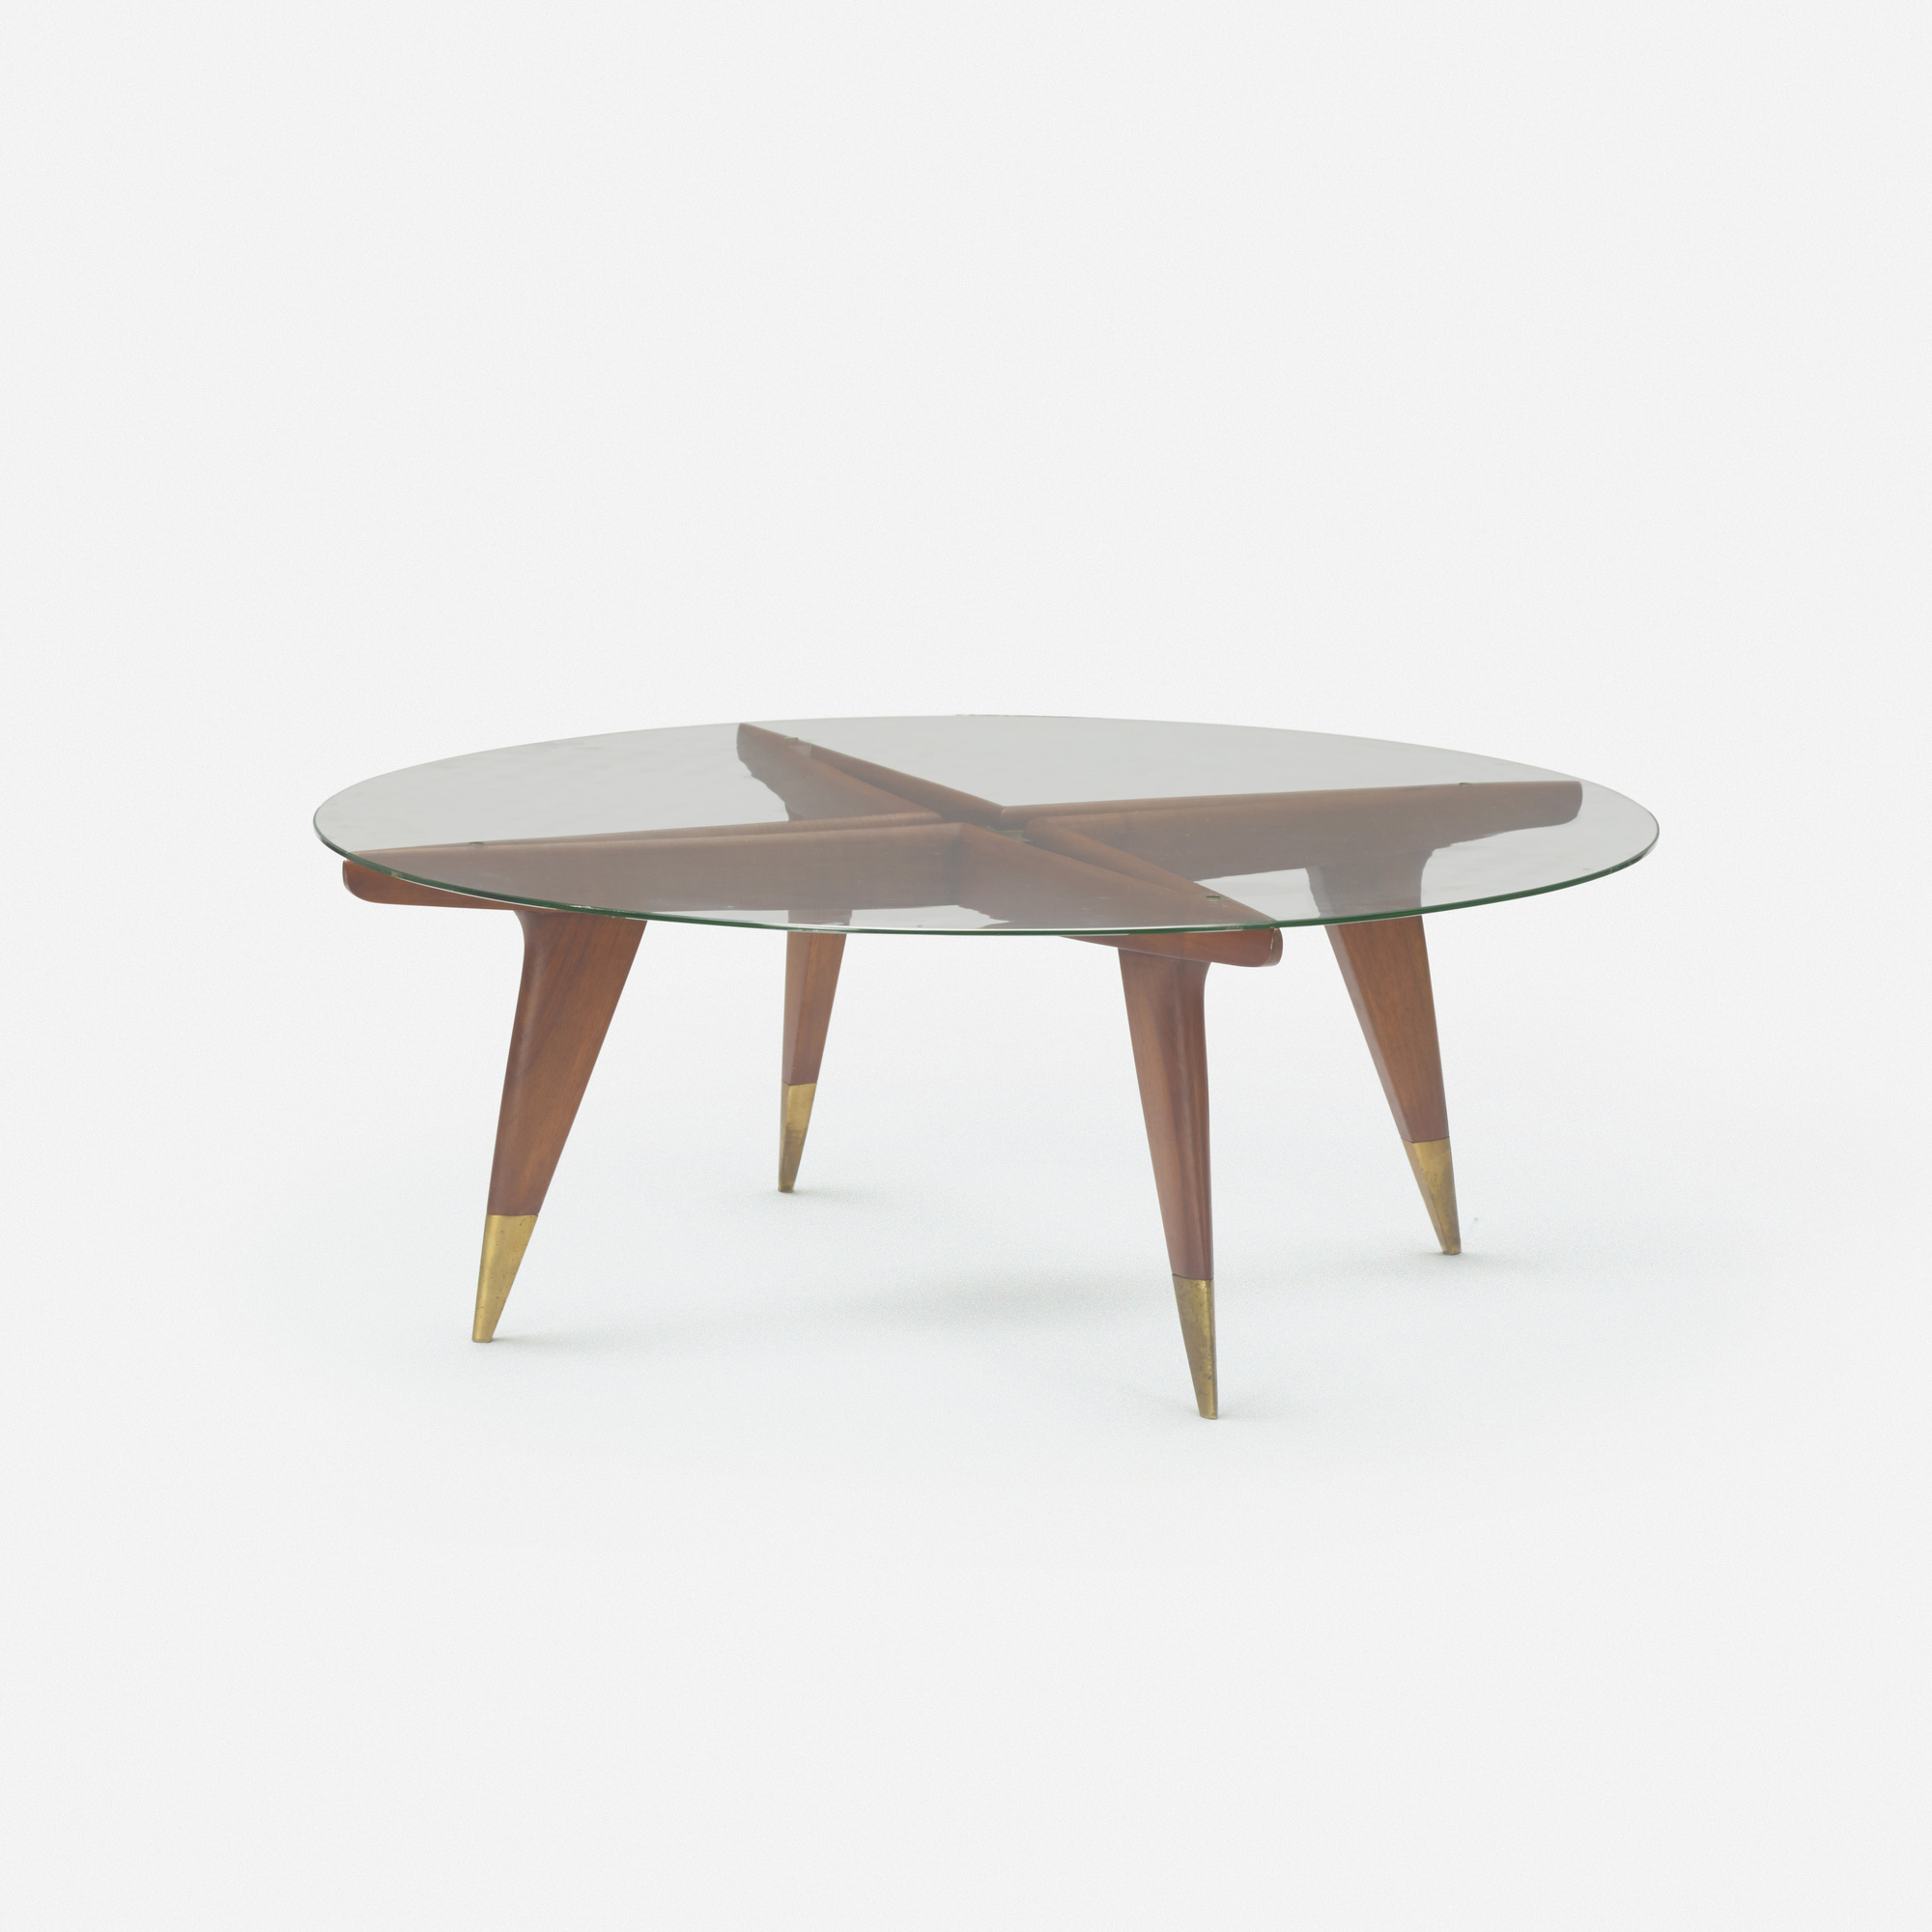 270: Gio Ponti / coffee table (1 of 2)